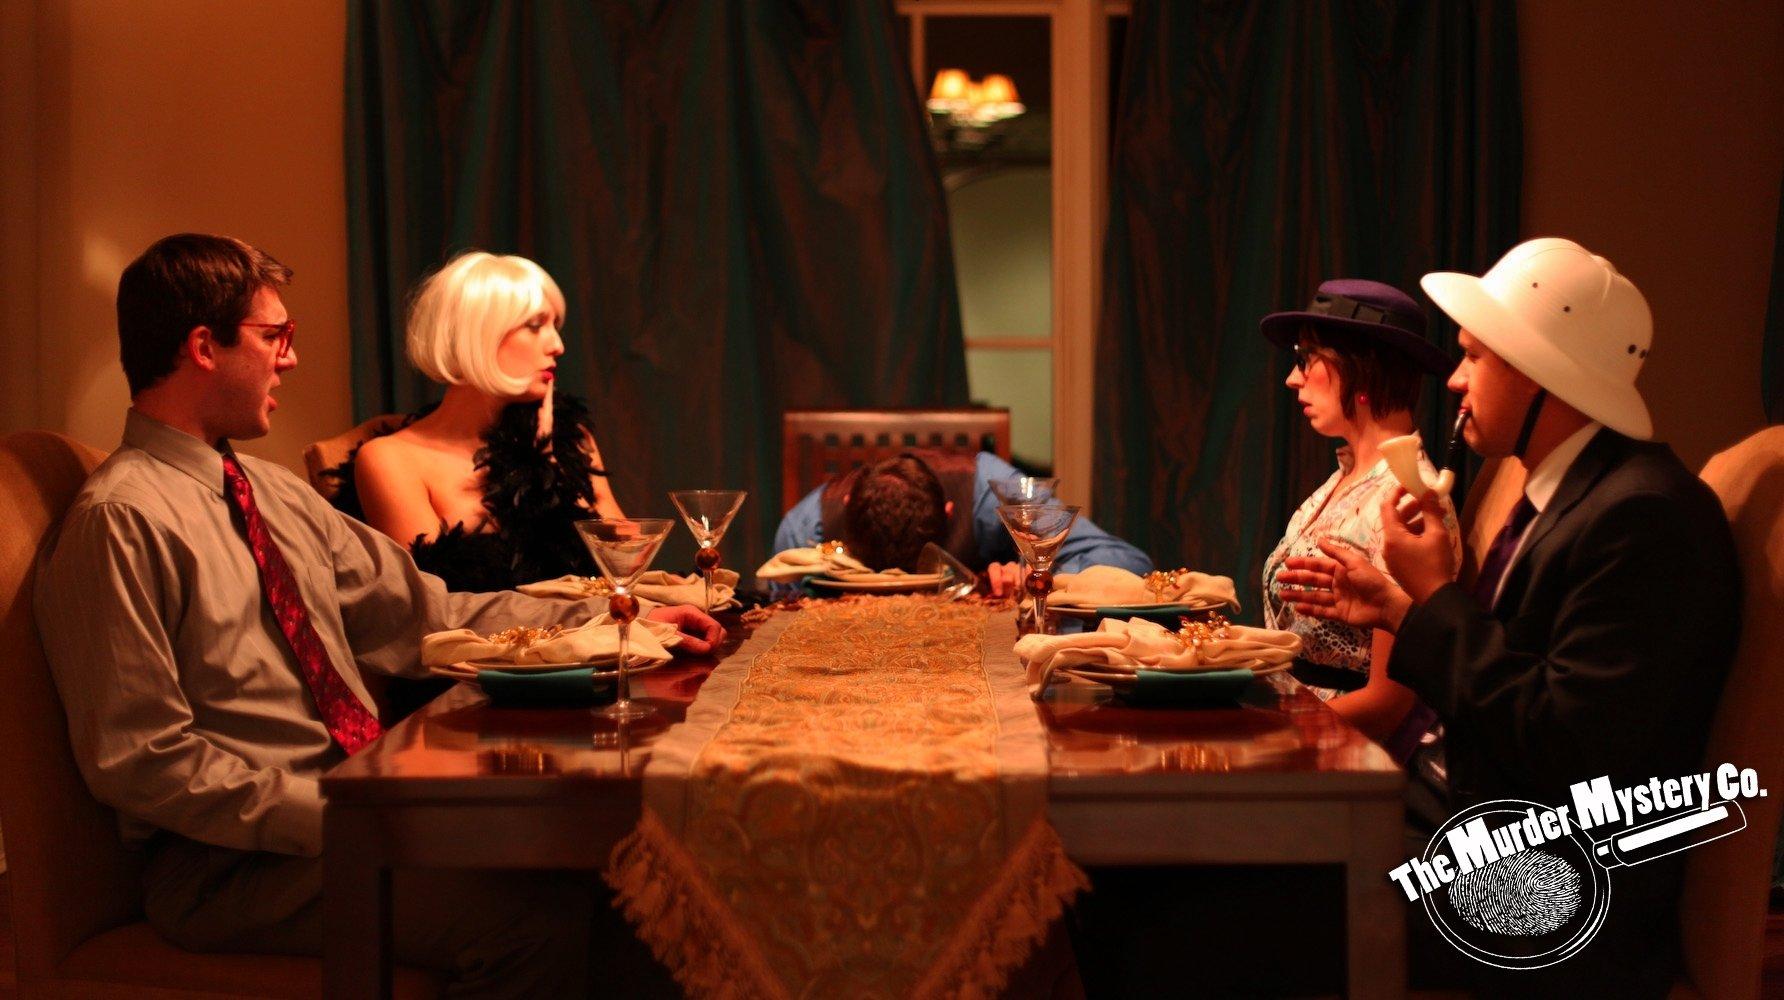 10 Fabulous Murder Mystery Dinner Party Ideas murder mystery dinner 21st idees pinterest murder mysteries 2021